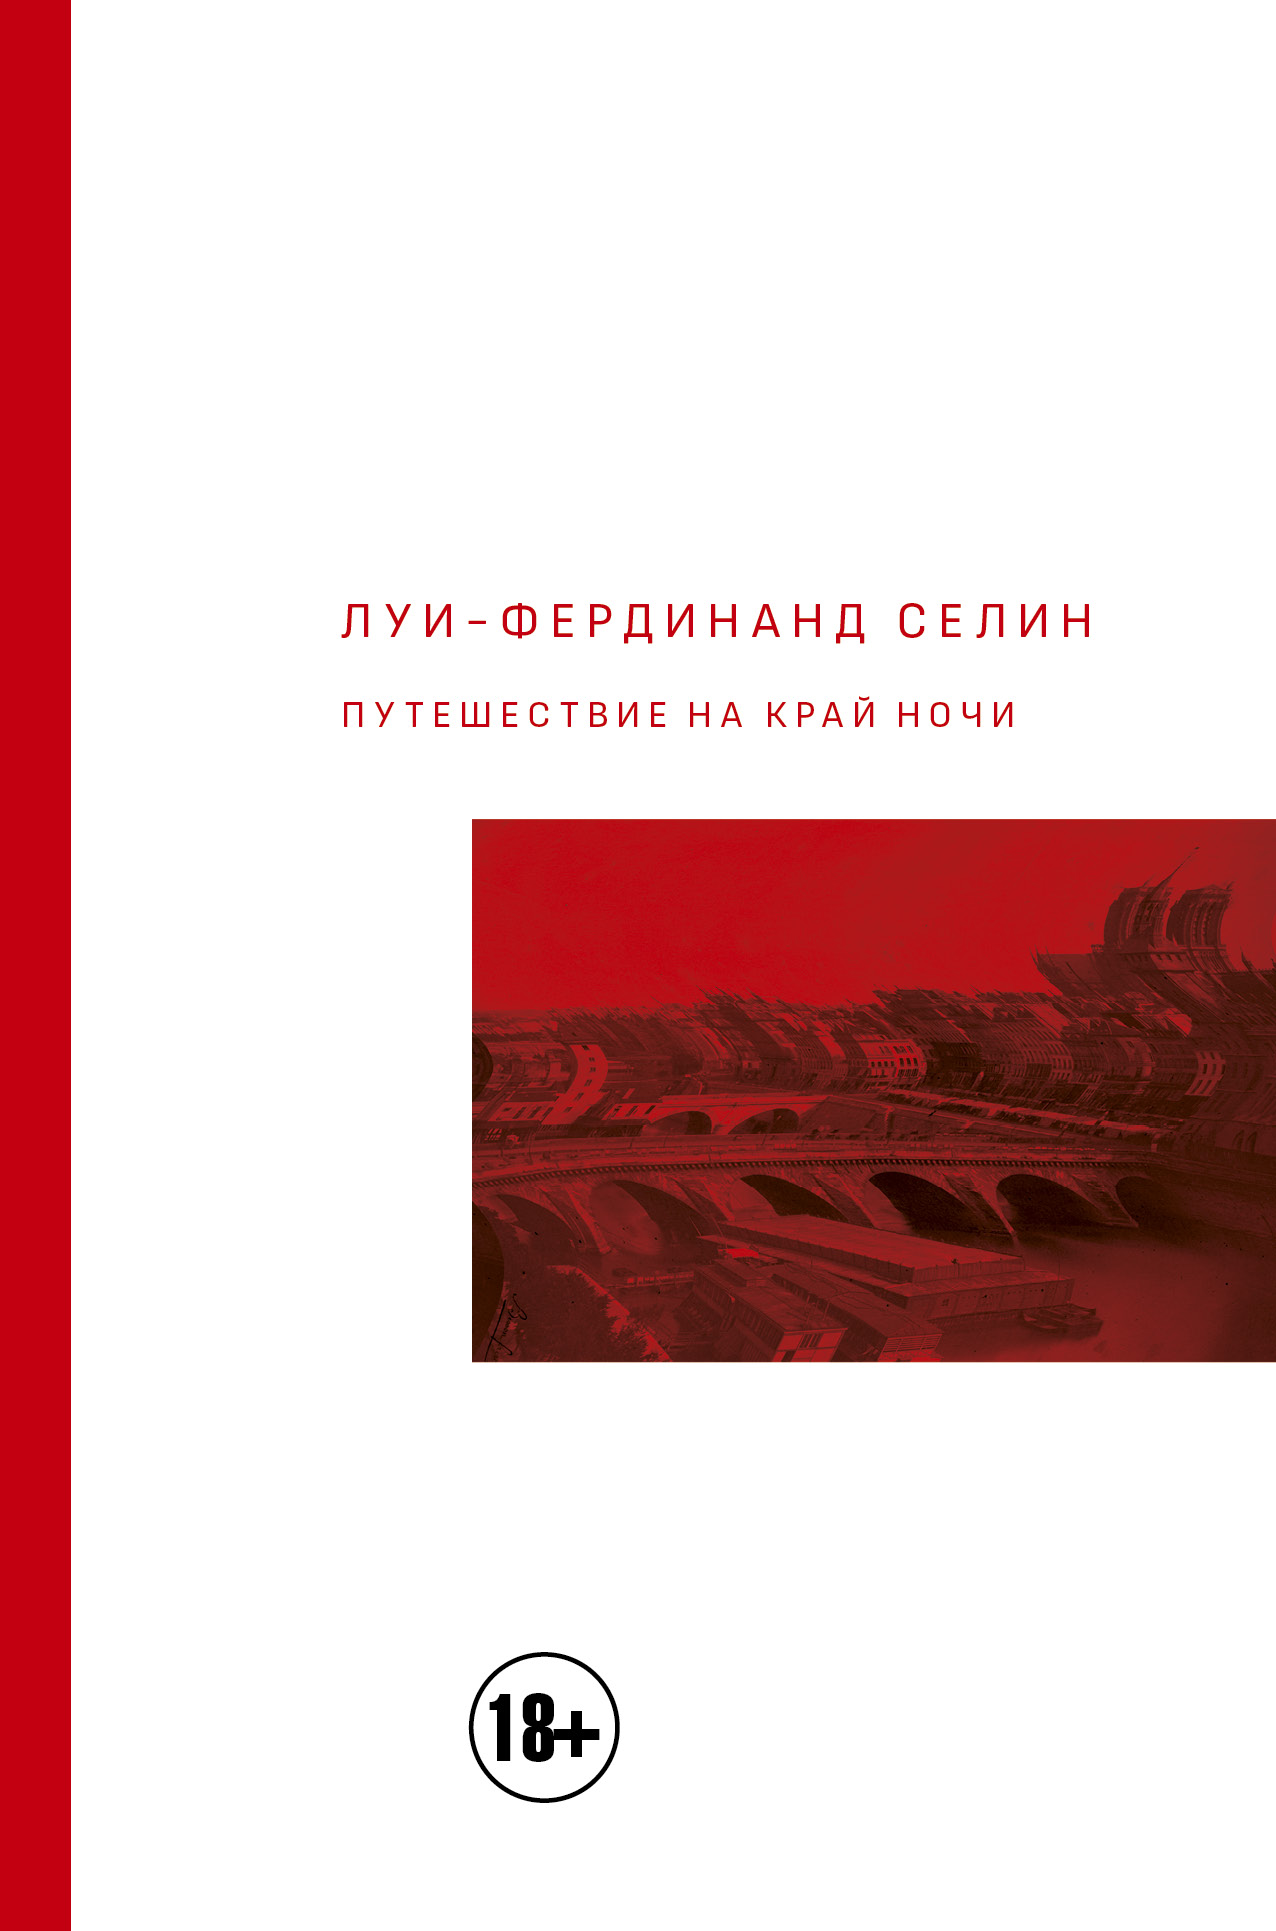 Луи-Фердинанд Селин Путешествие на край ночи а а селин новгородское общество в эпоху смуты